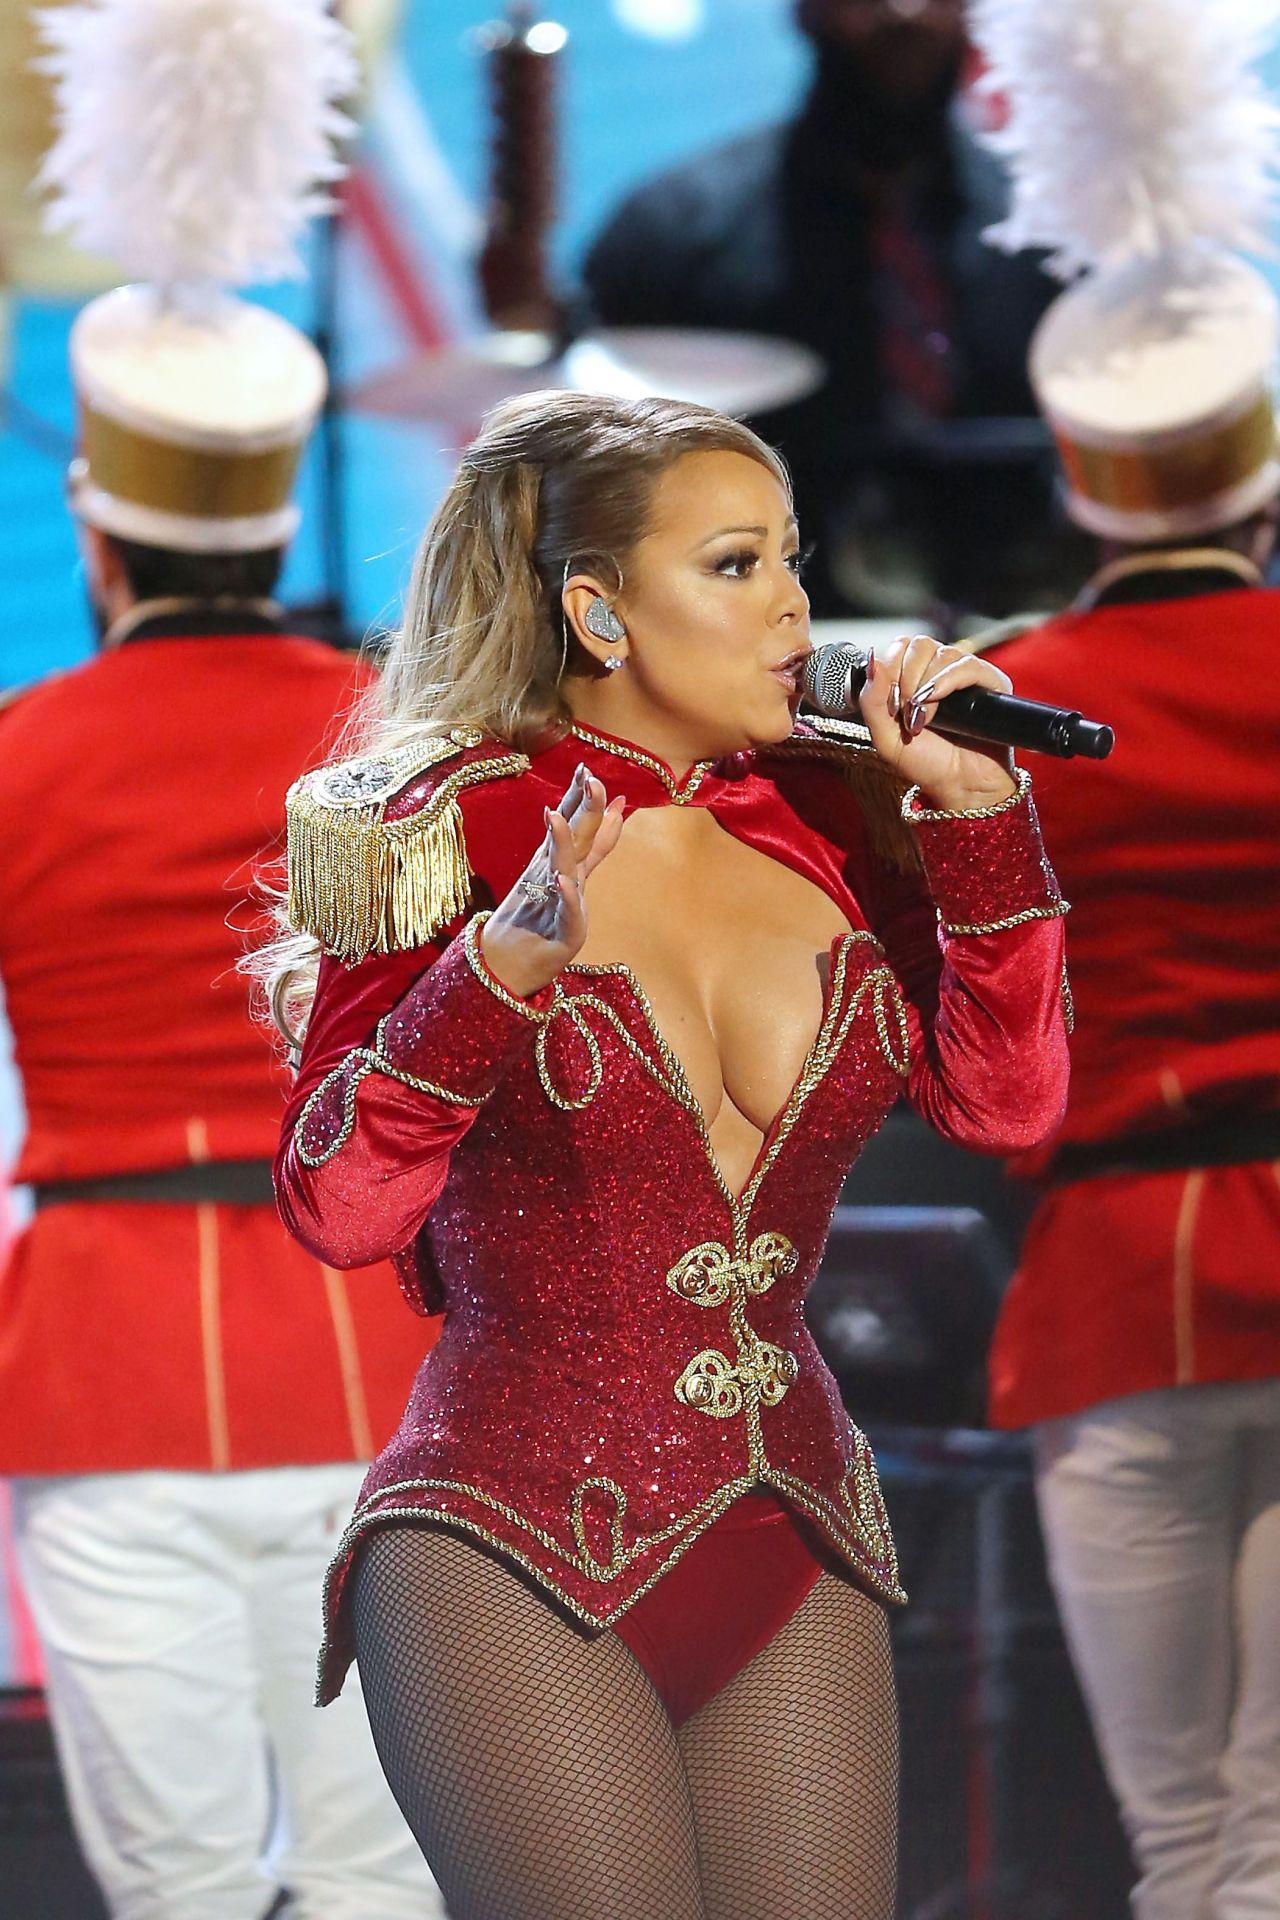 Mariah carey performing vh1 divas unsilent night nyc 12 2 2016 - Mariah carey diva ...